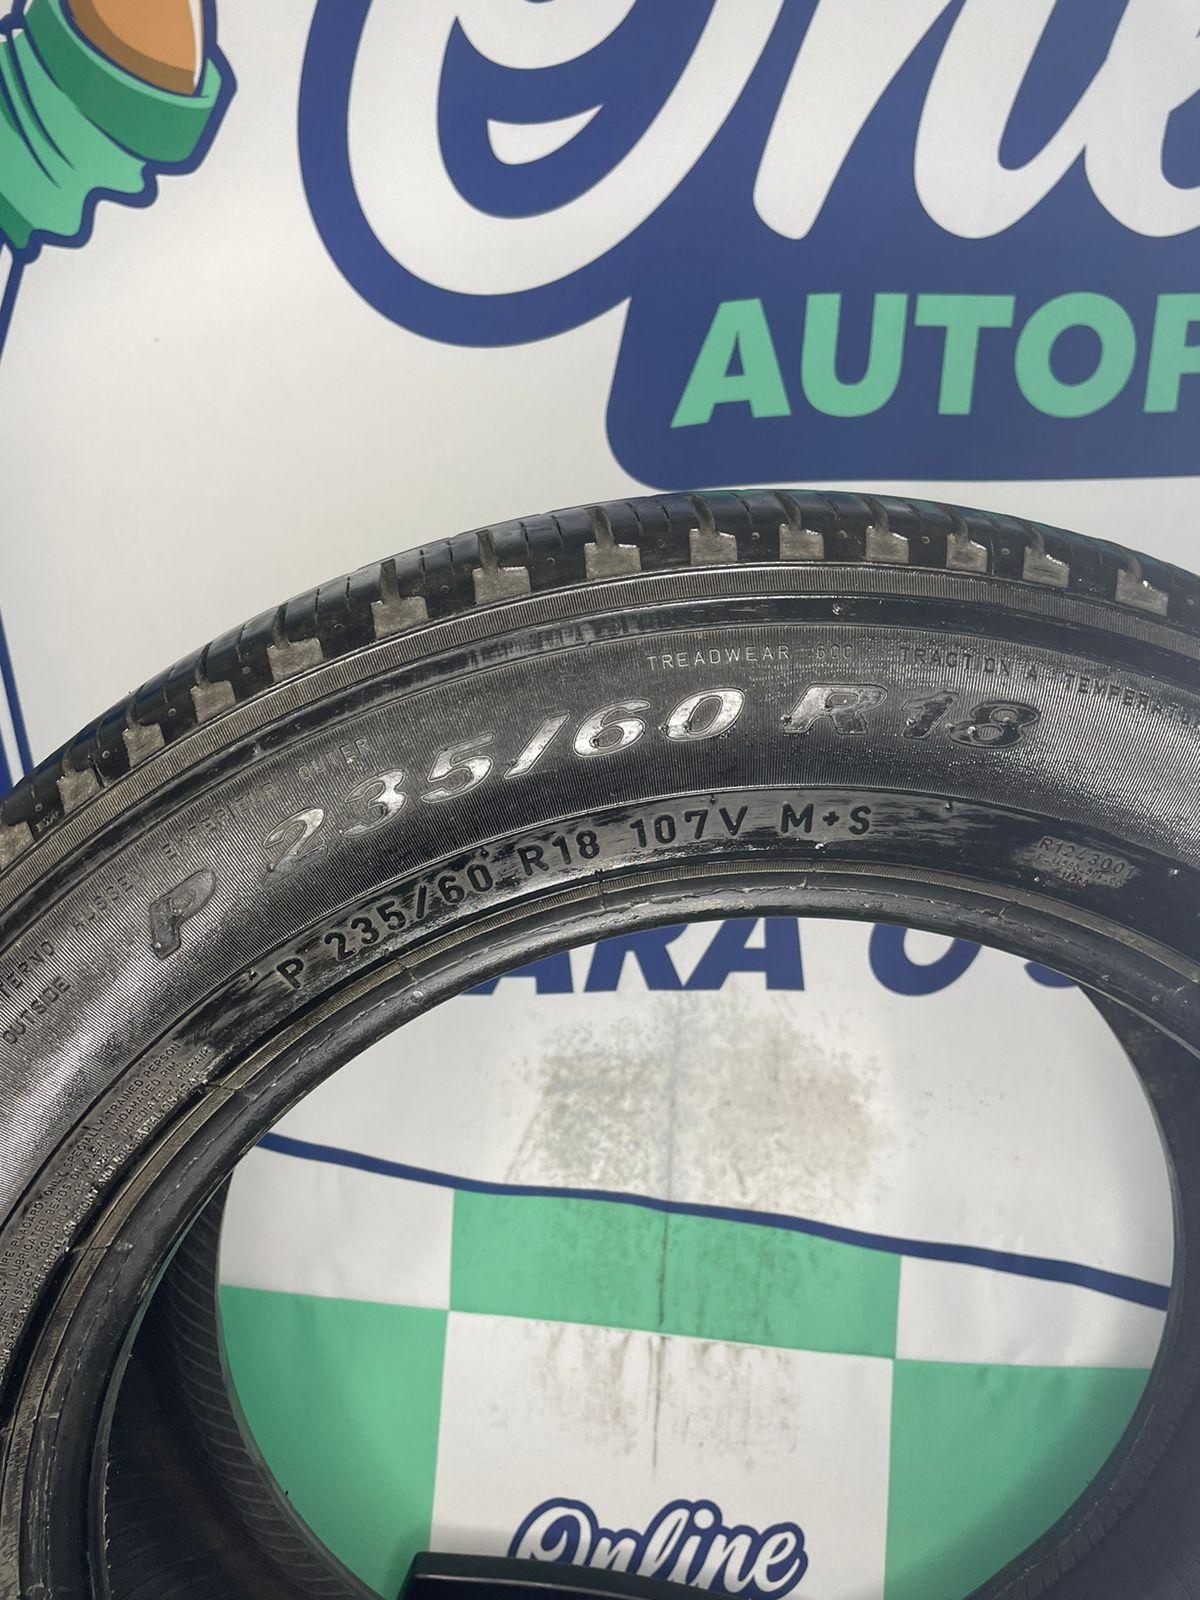 Par Pneu 235/60/18 Pirelli Scorpion Verde 107V